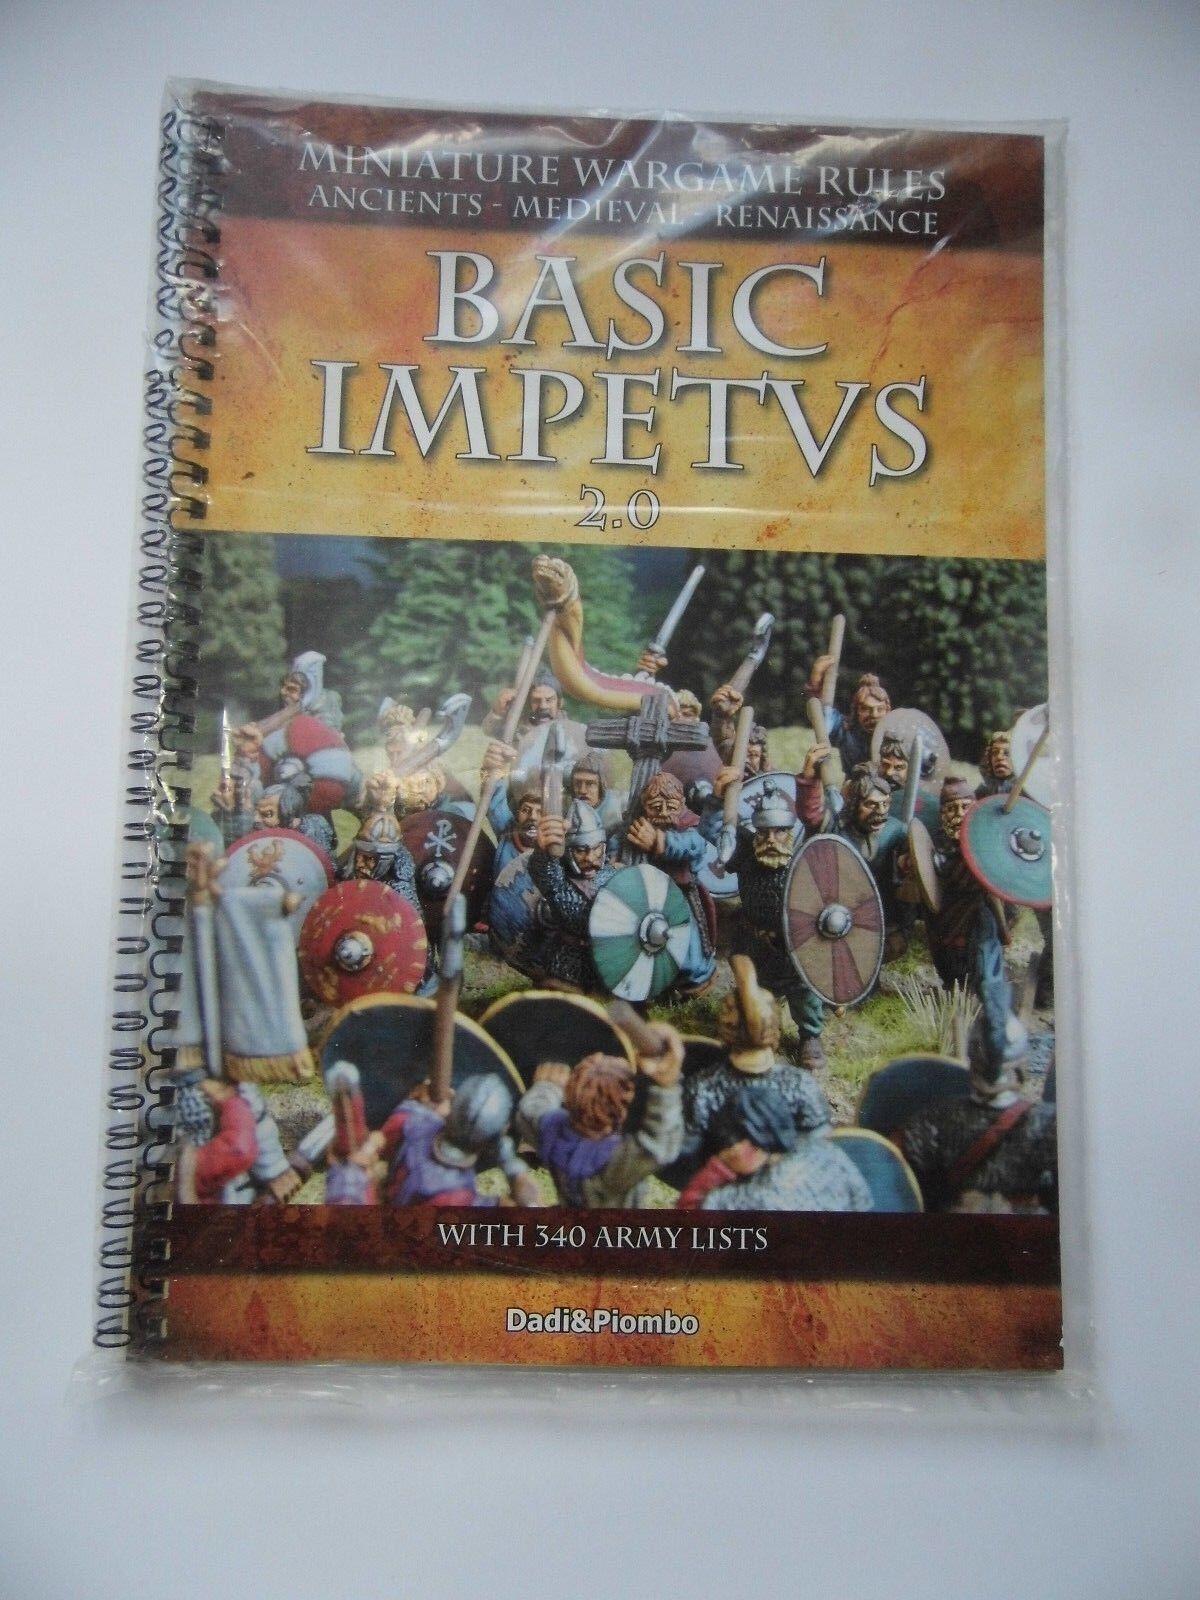 BASIC IMPETVS 2.0 - (SOFTCOVER) MINIATURE WARGAME RULES  - NEW SEALED